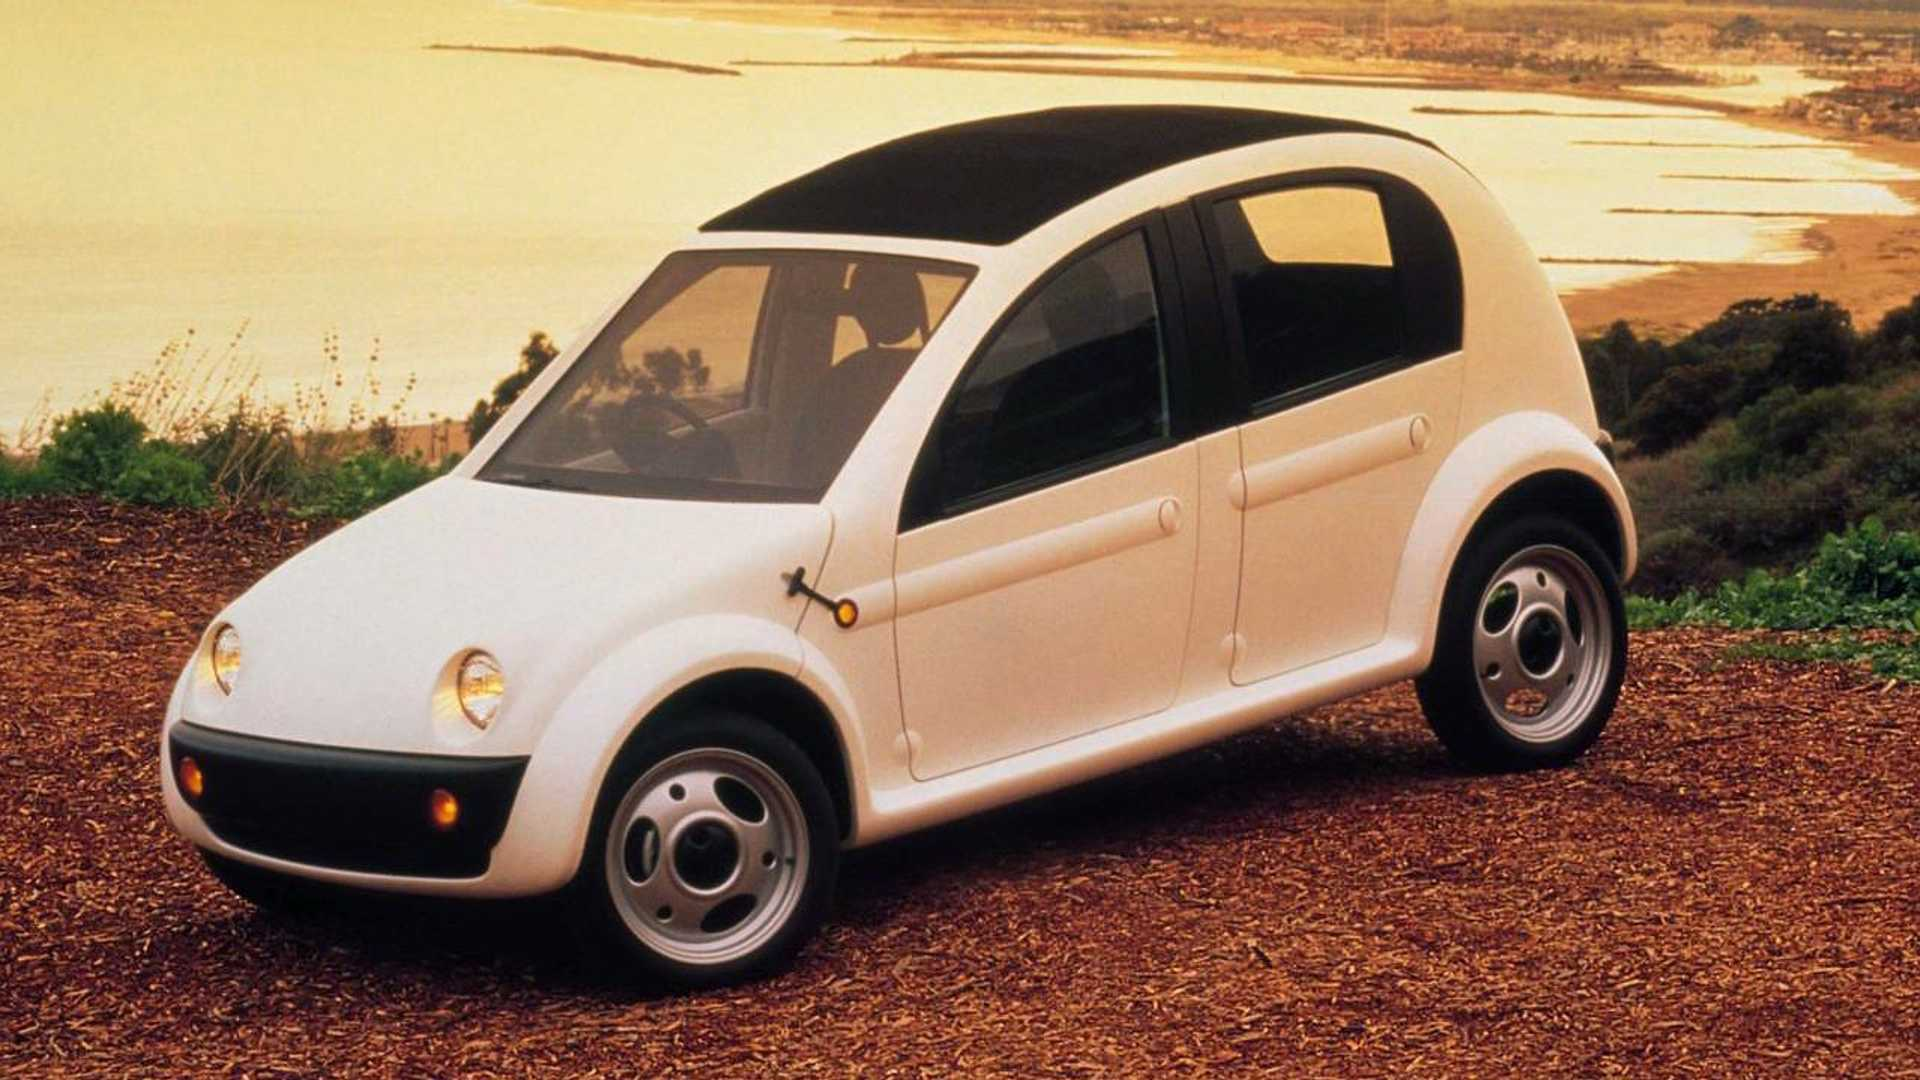 Koncept koji smo zaboravili – Chrysler CCV iz 1997. godine